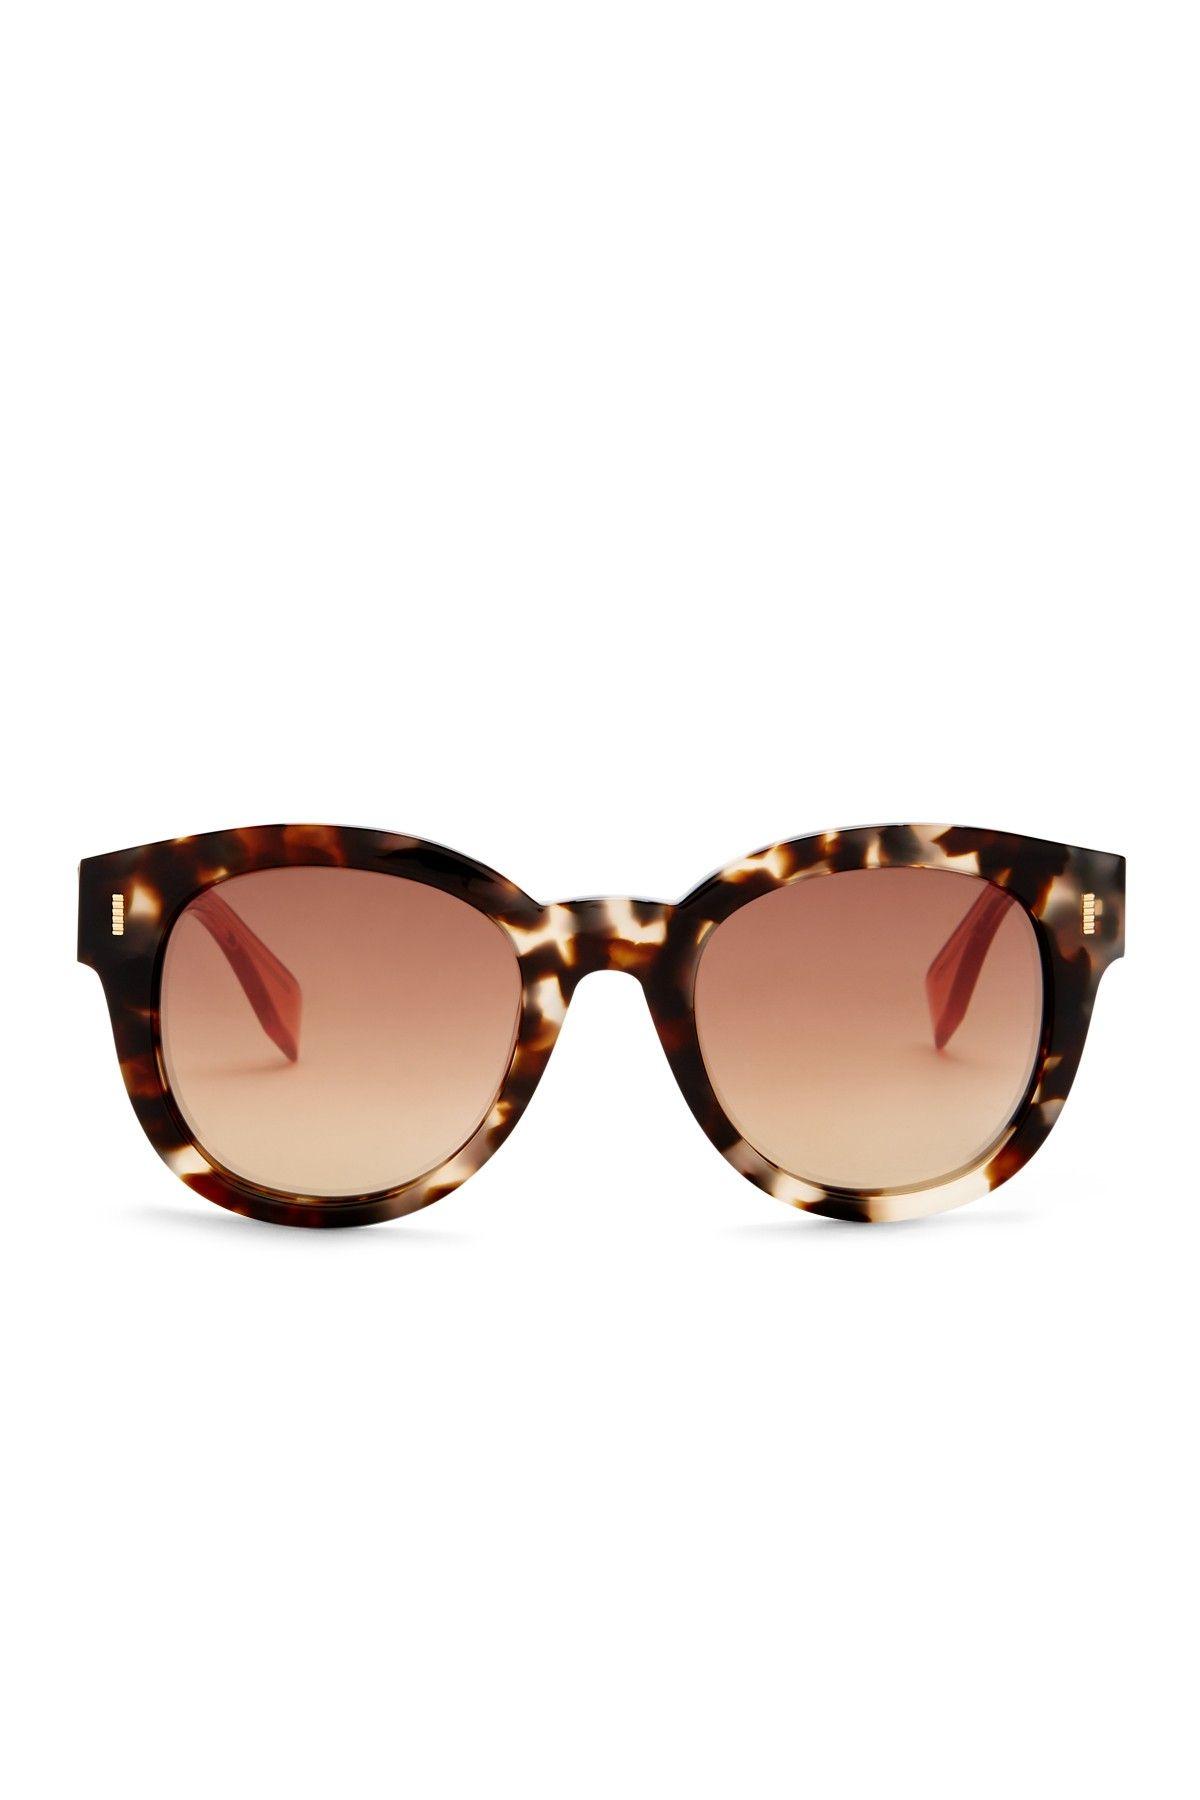 085fd3a06337 Women s Oversized Sunglasses Oversized Sunglasses